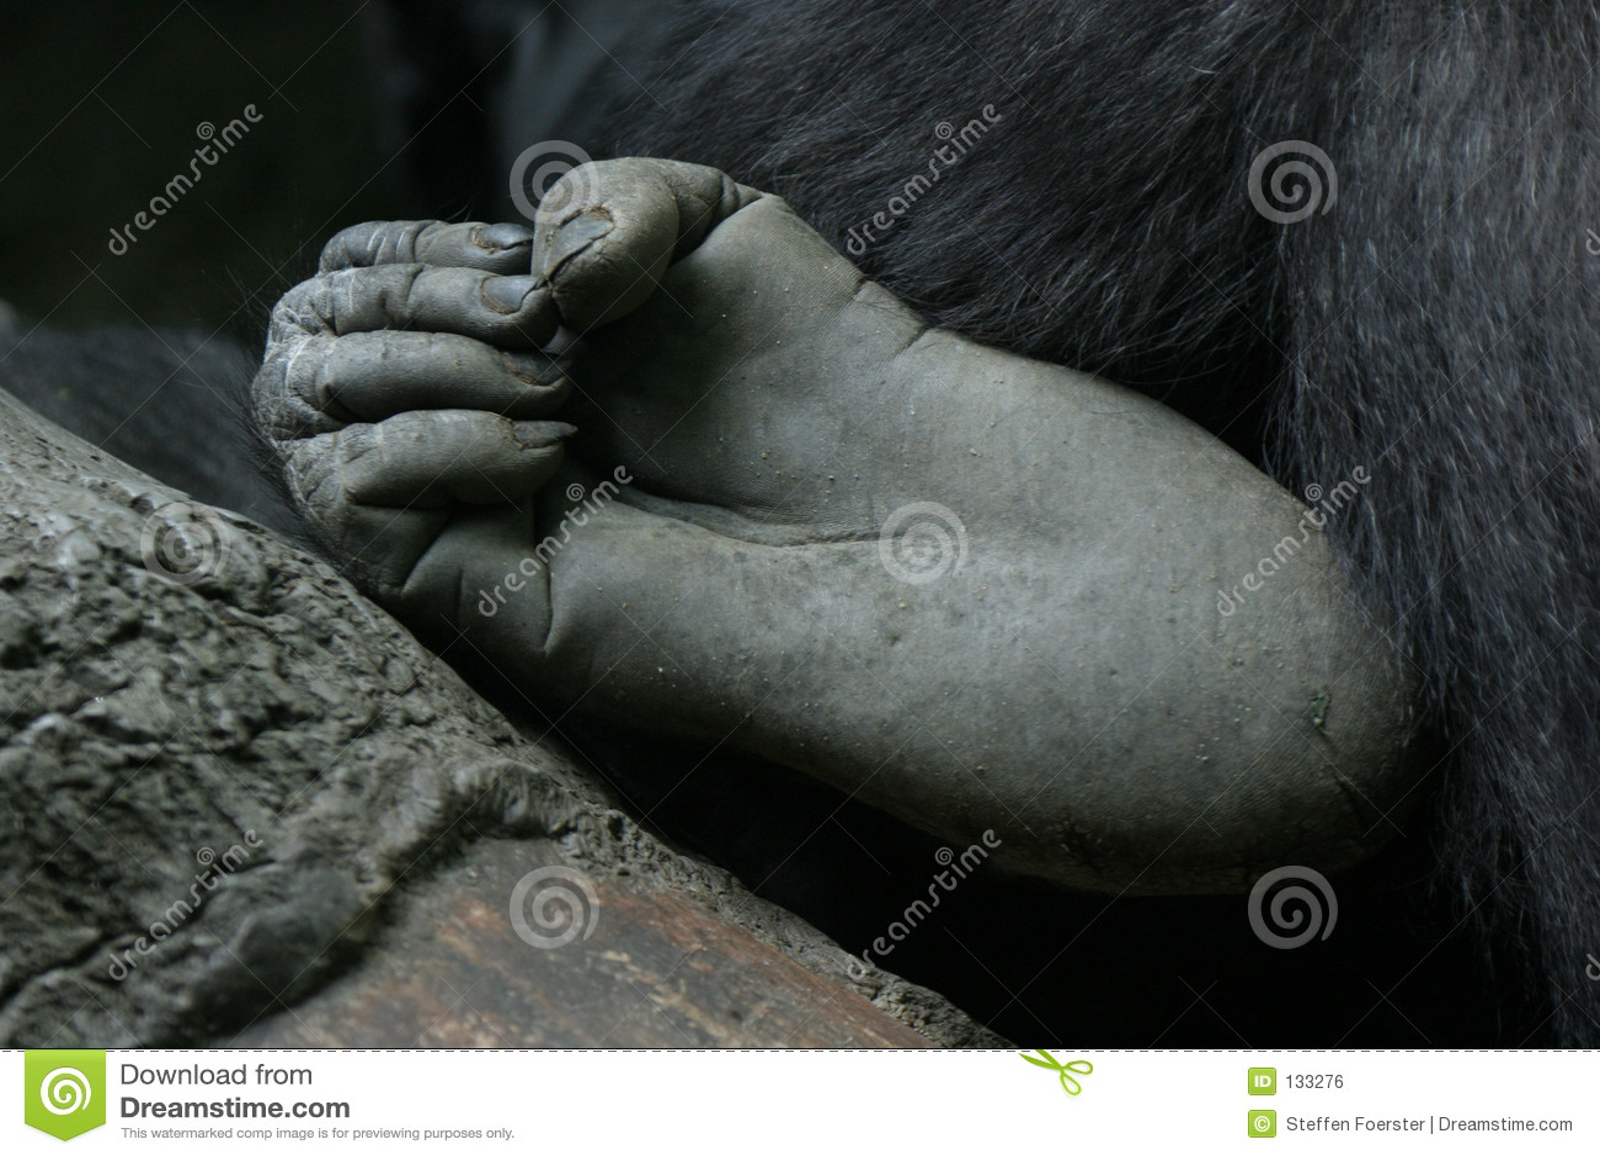 Pied de gorille